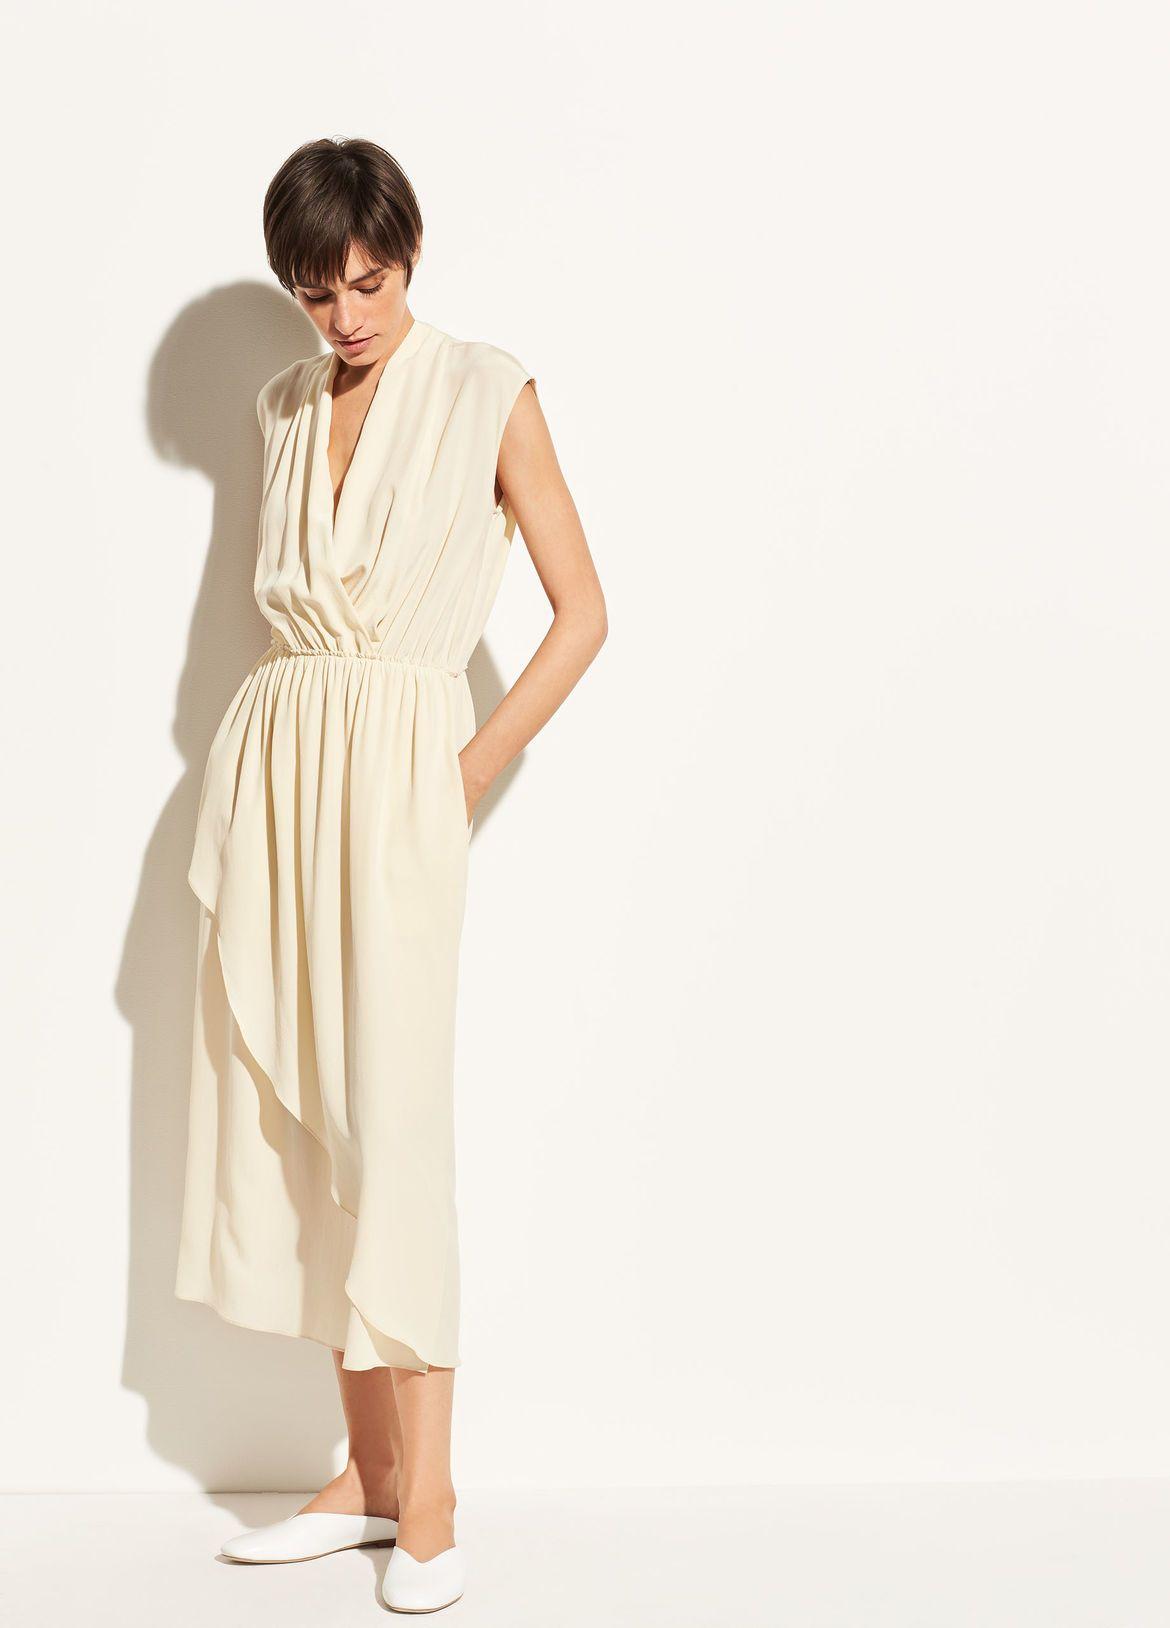 Women S Dresses Jumpsuits Vince Cross Front Dress Silk Dress Dresses [ 1628 x 1170 Pixel ]